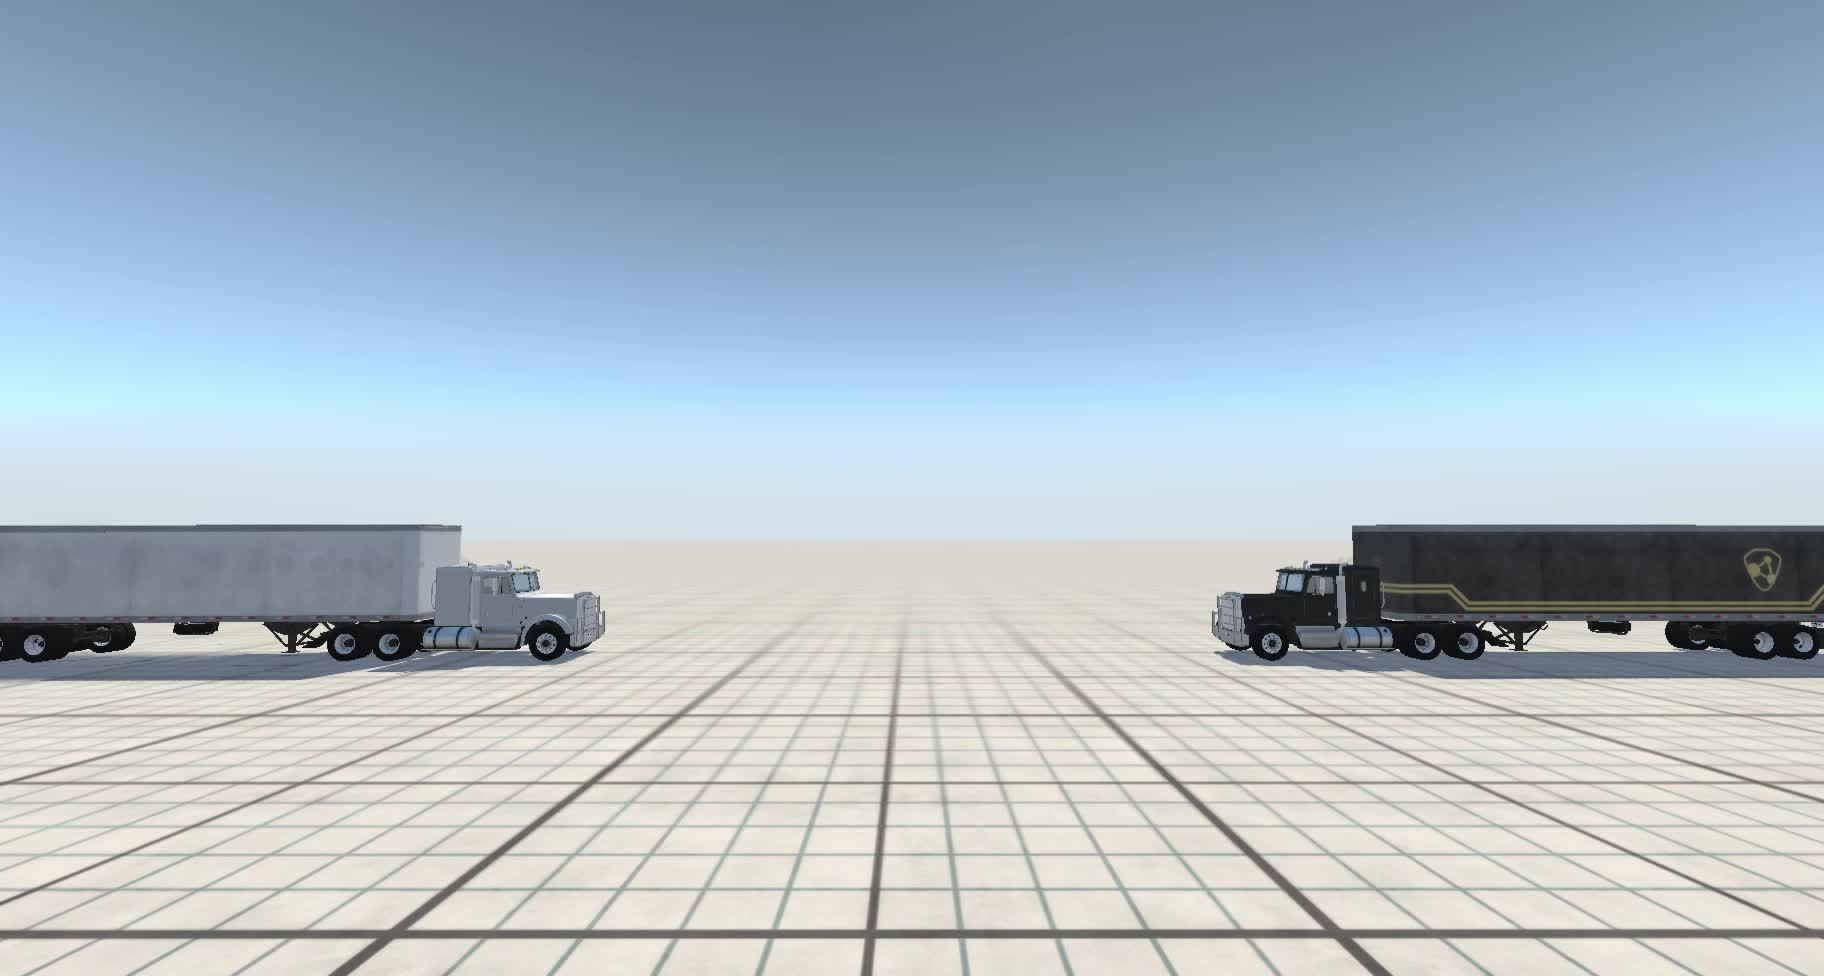 Crash, Gamephysics, Symmetry, Trucks, Matrix Reloaded, Simulated Recreation GIFs